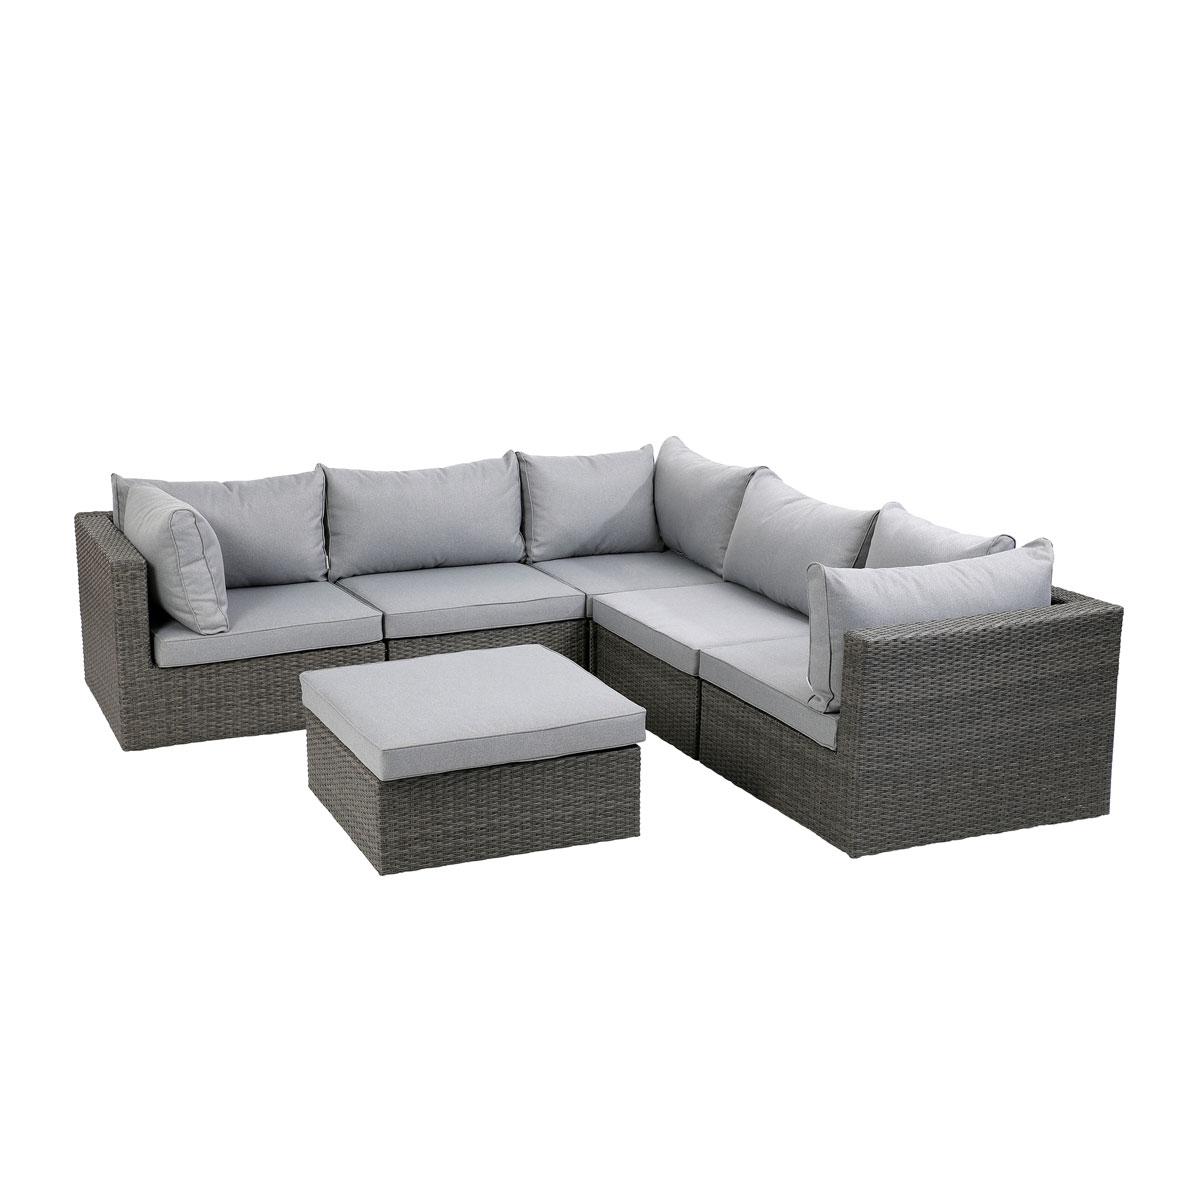 Loungemöbel - Lounge Set Kalifornien, grau, inkl. Kissen  - Onlineshop Hellweg